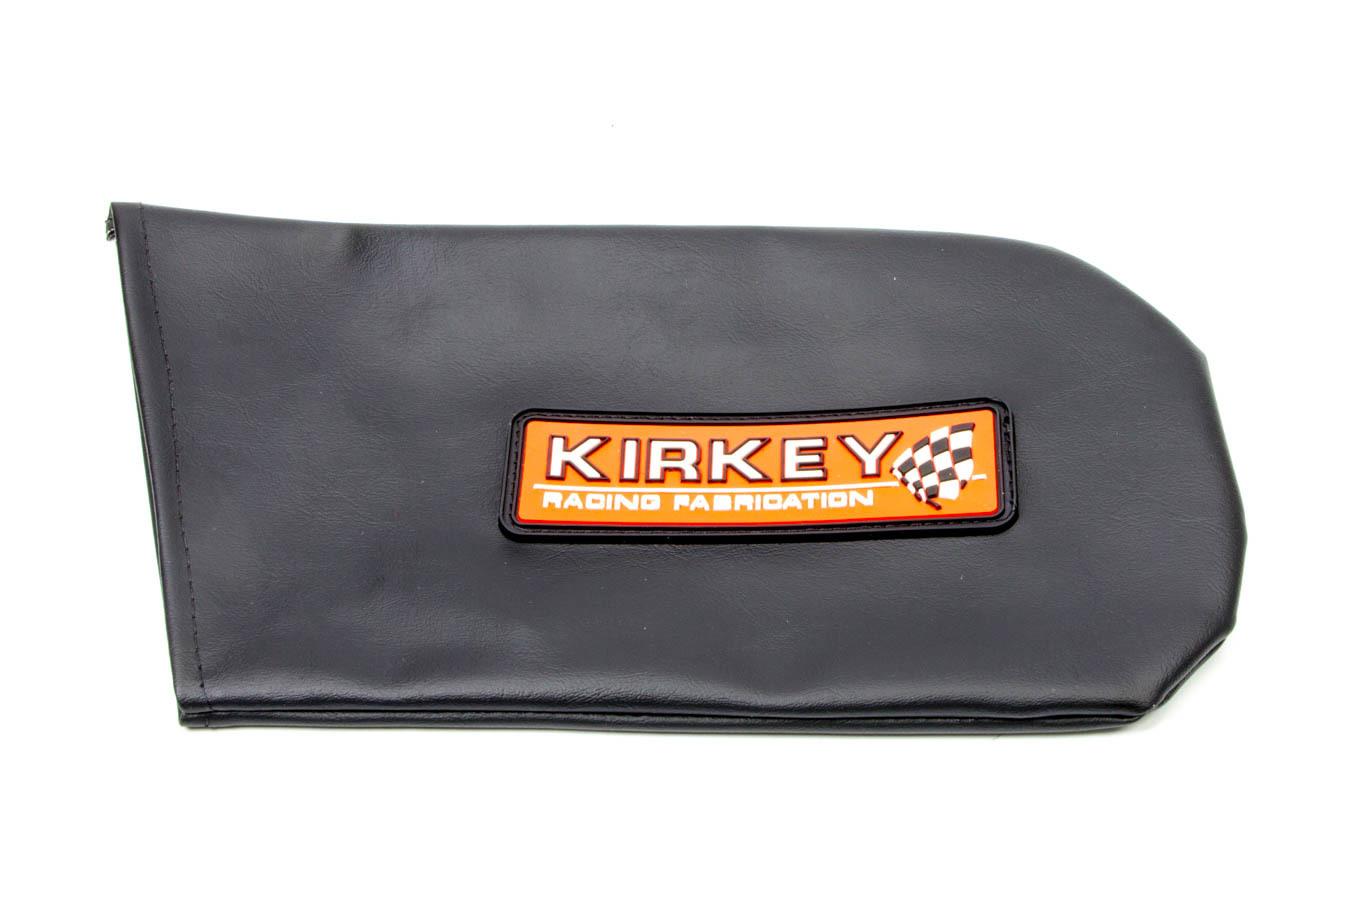 Kirkey 00501 Shoulder Support Cover, Passenger Side, Vinyl, Black, Each